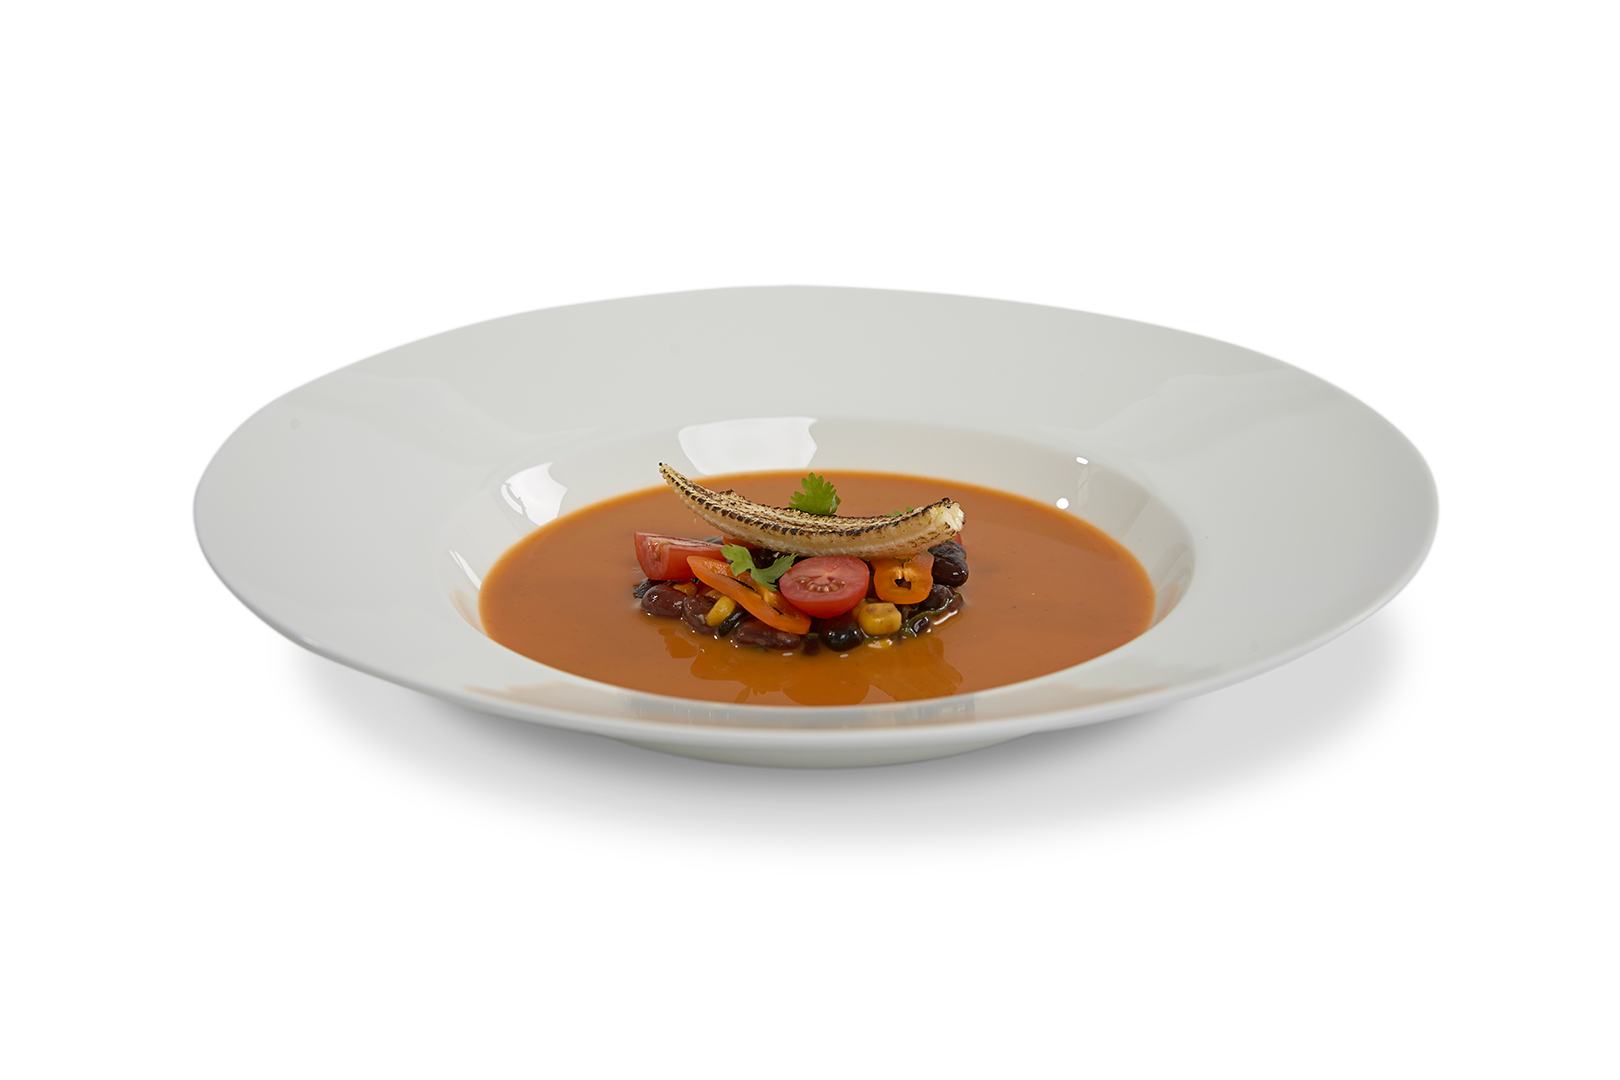 Chili Sin Carne soep met een garnituur van gemengde bonen, bosui, puntpaprika en gebrande baby mais